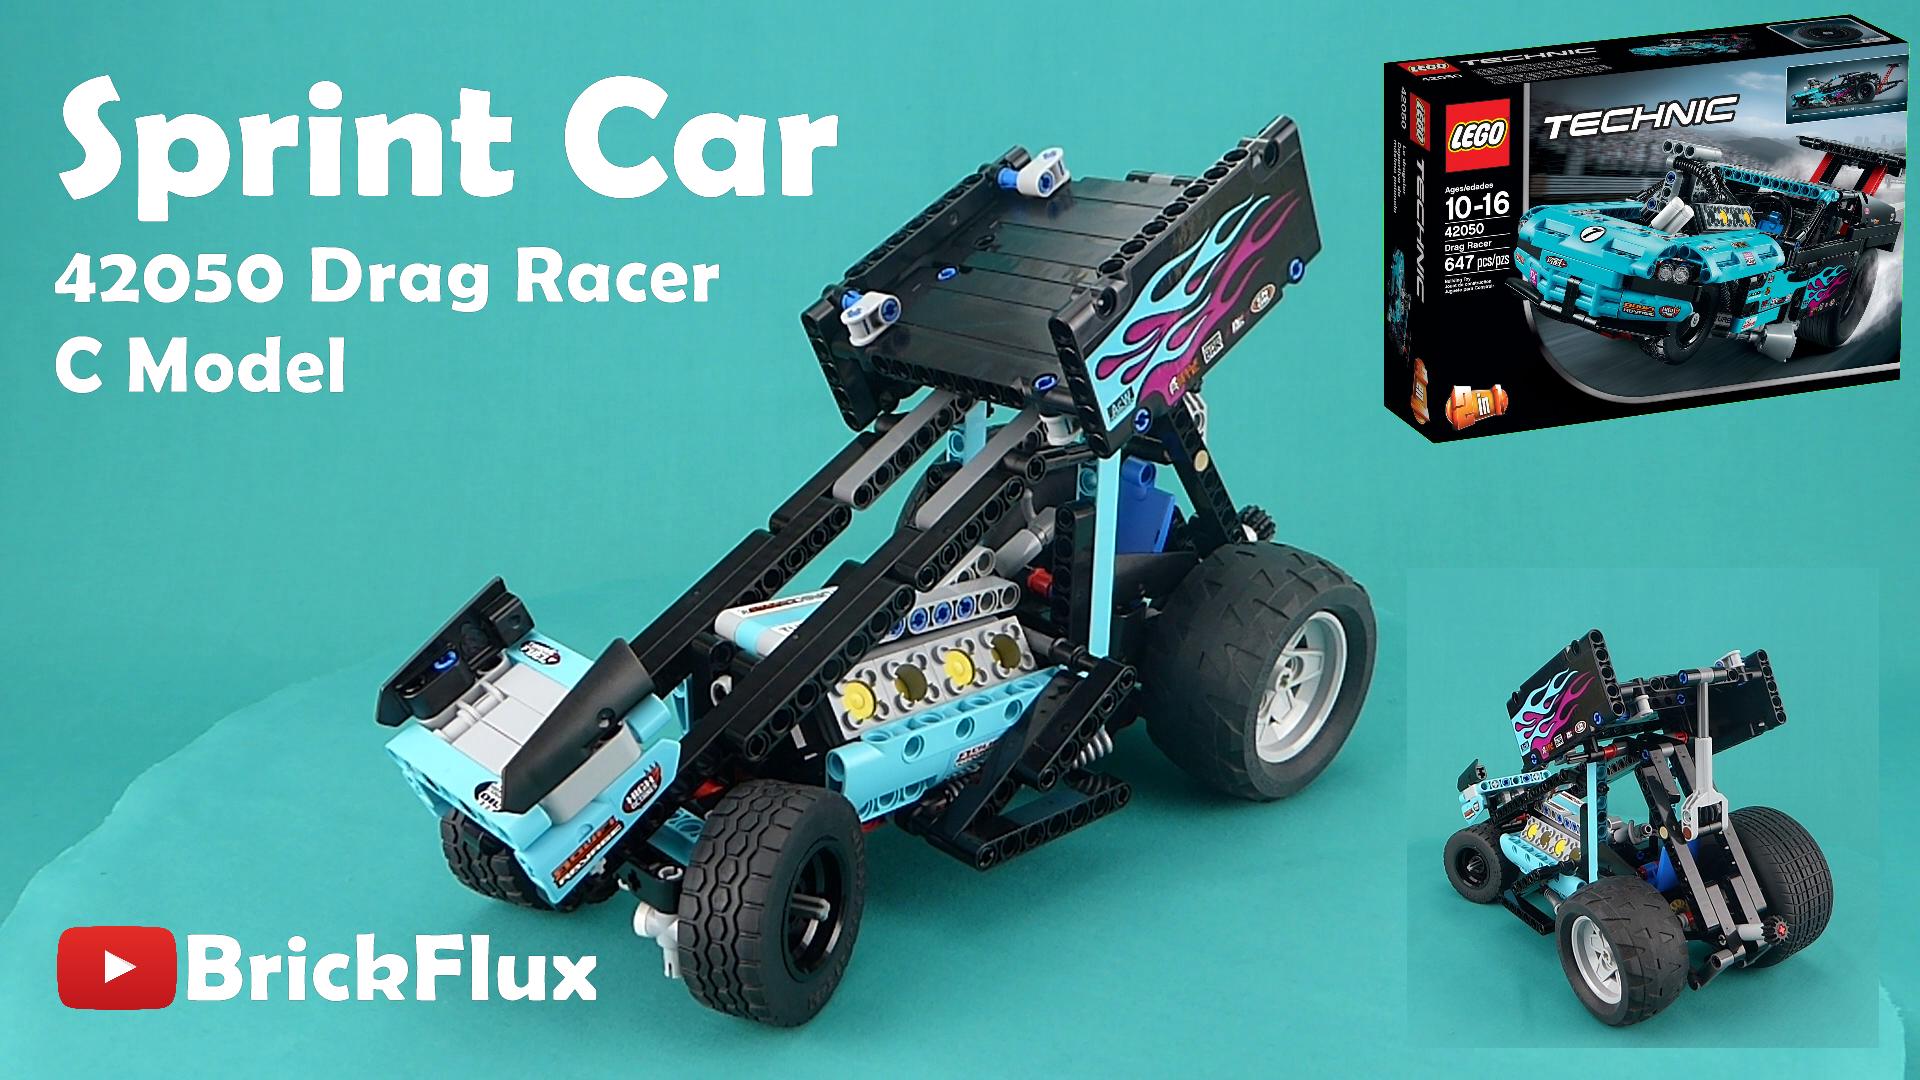 Pin By Brandy Jepsen On Kid Stuff Lego Sprint Cars Vehicles